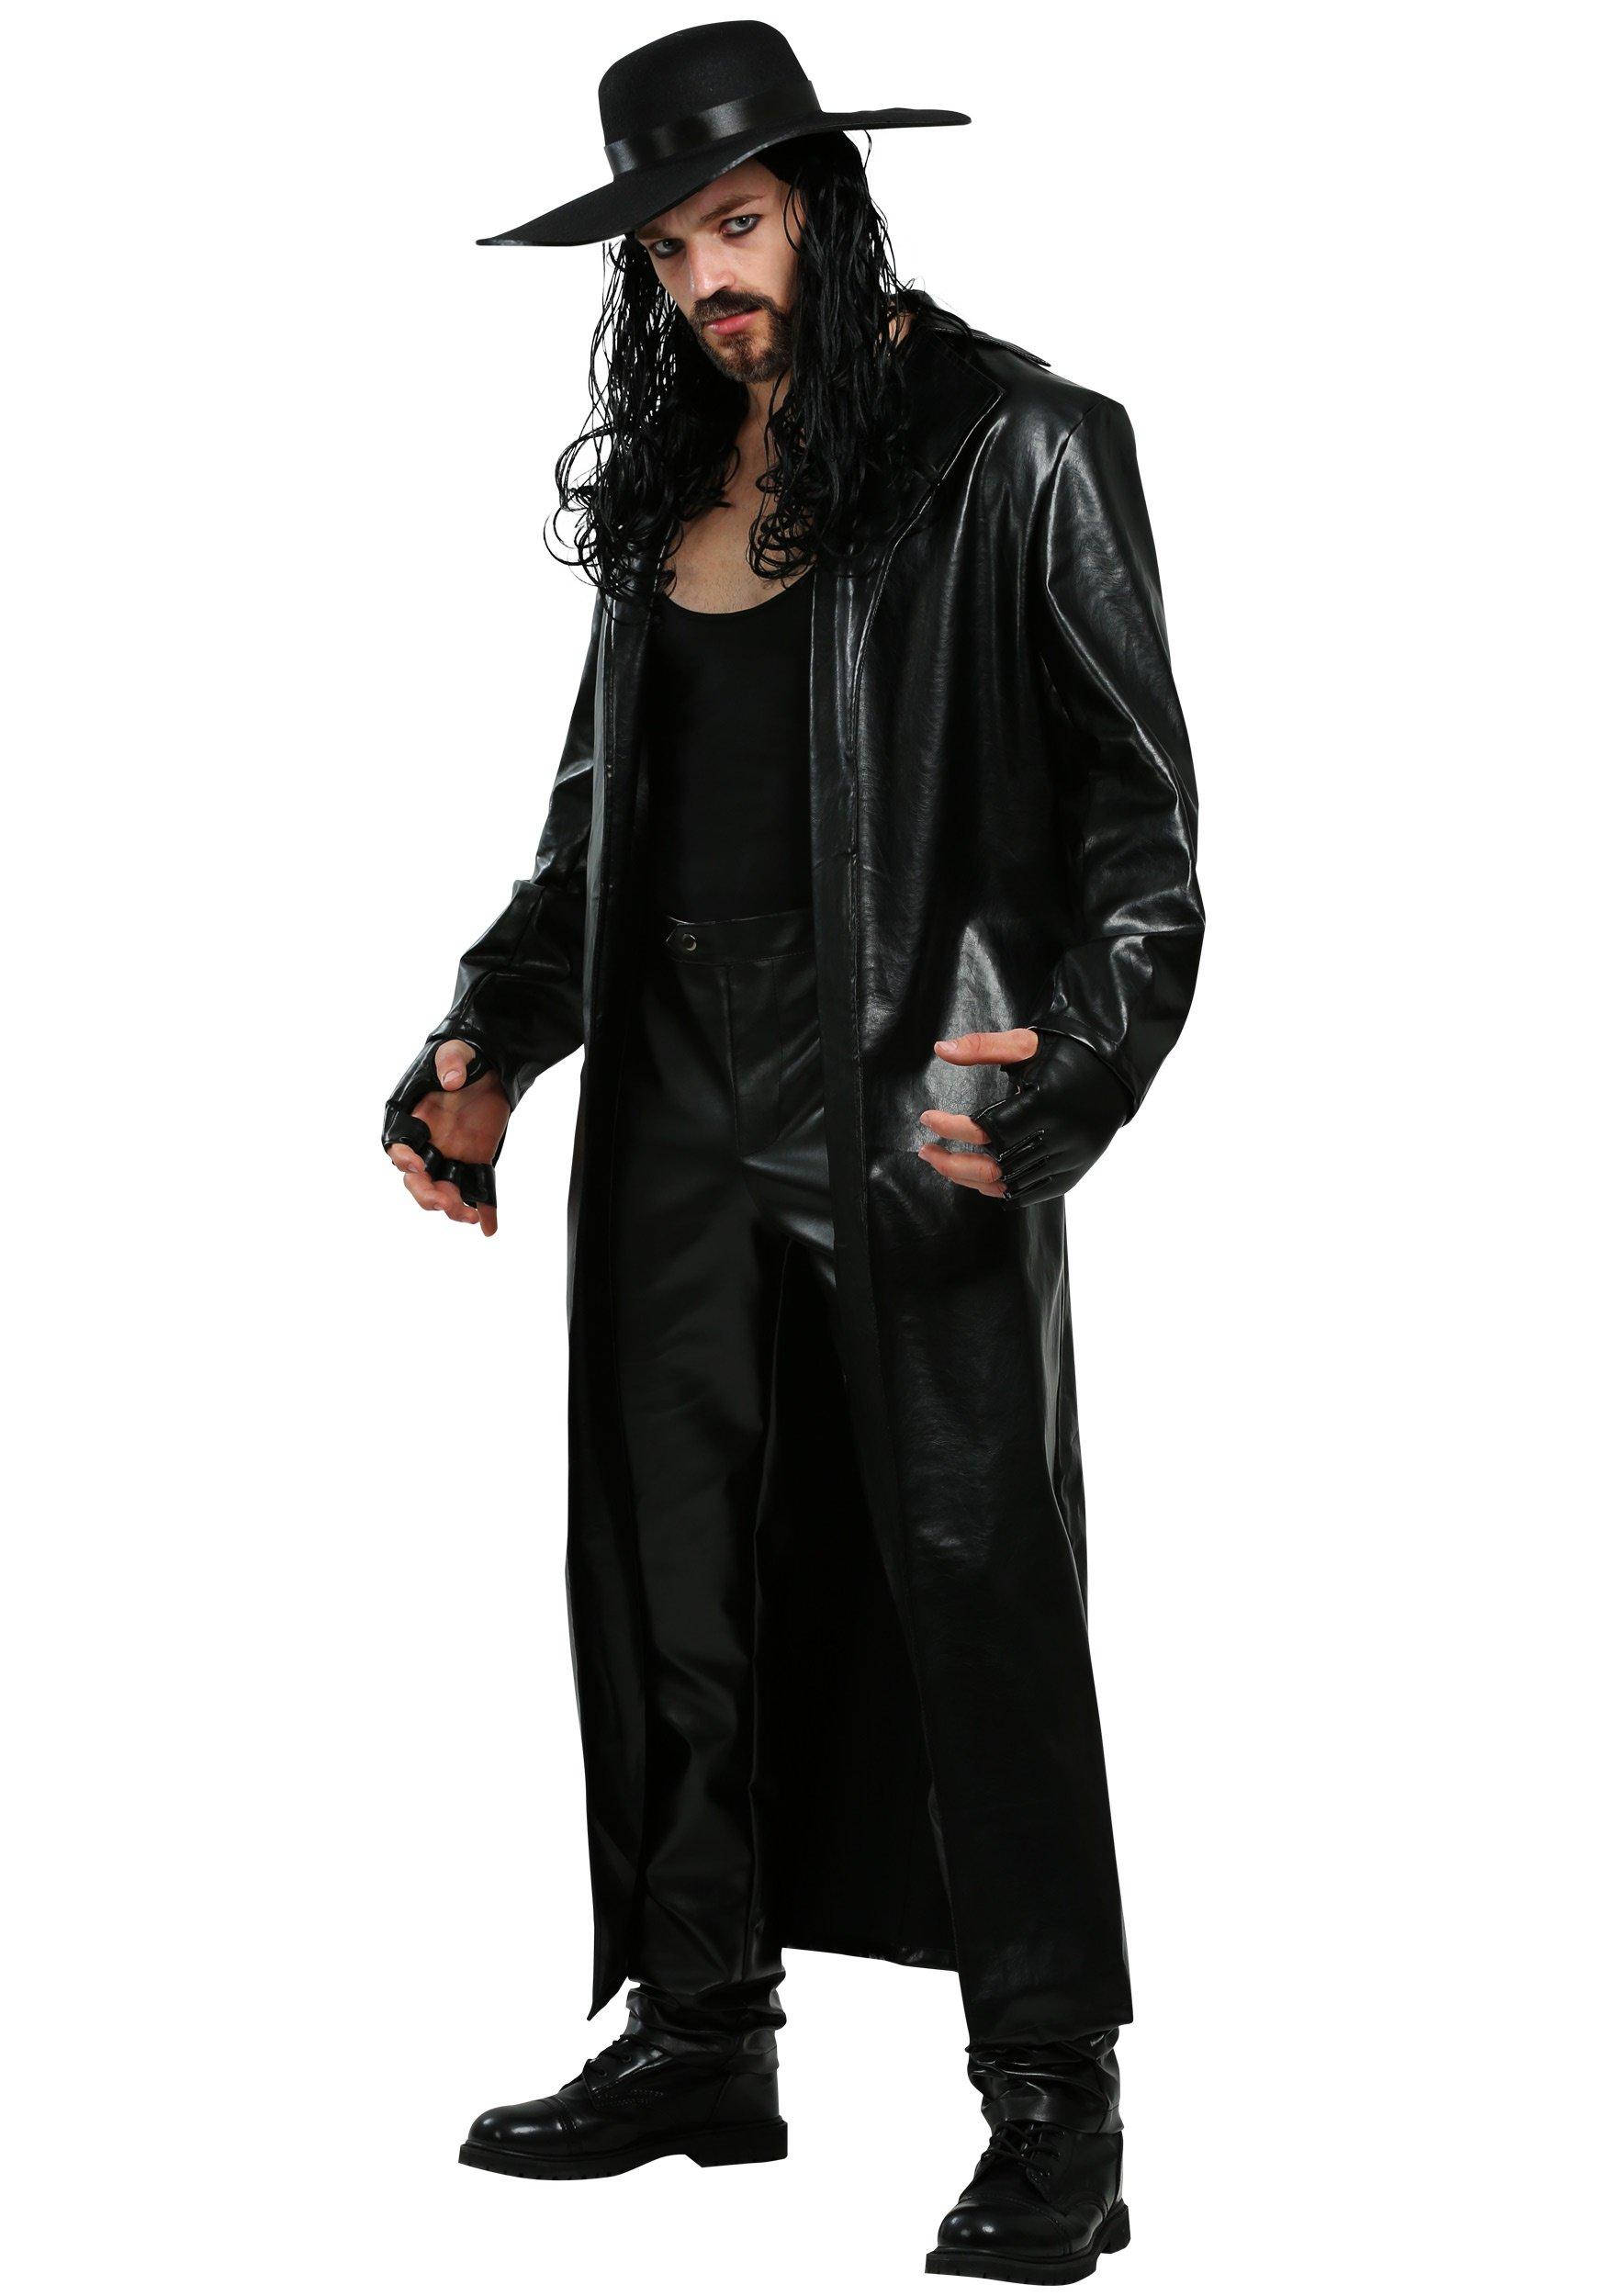 Plus Size WWE Undertaker Costume 2X by FunCostumes